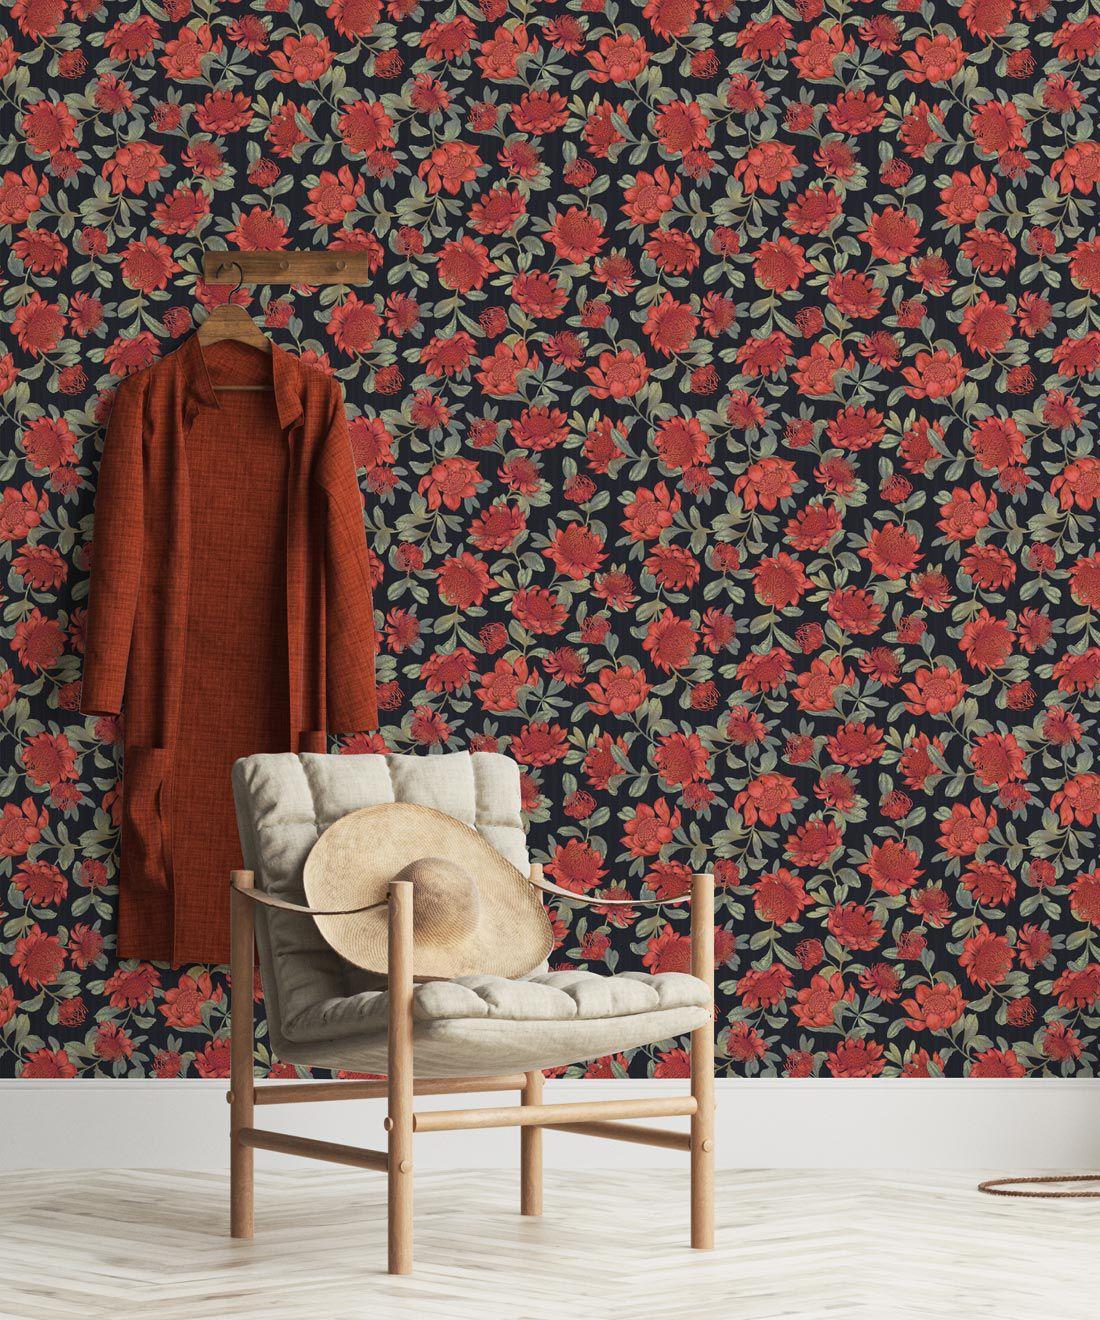 Waratah Wallpaper • Eloise Short • Vintage Floral Wallpaper •Granny Chic Wallpaper • Grandmillennial Style Wallpaper •Slate •Insitu